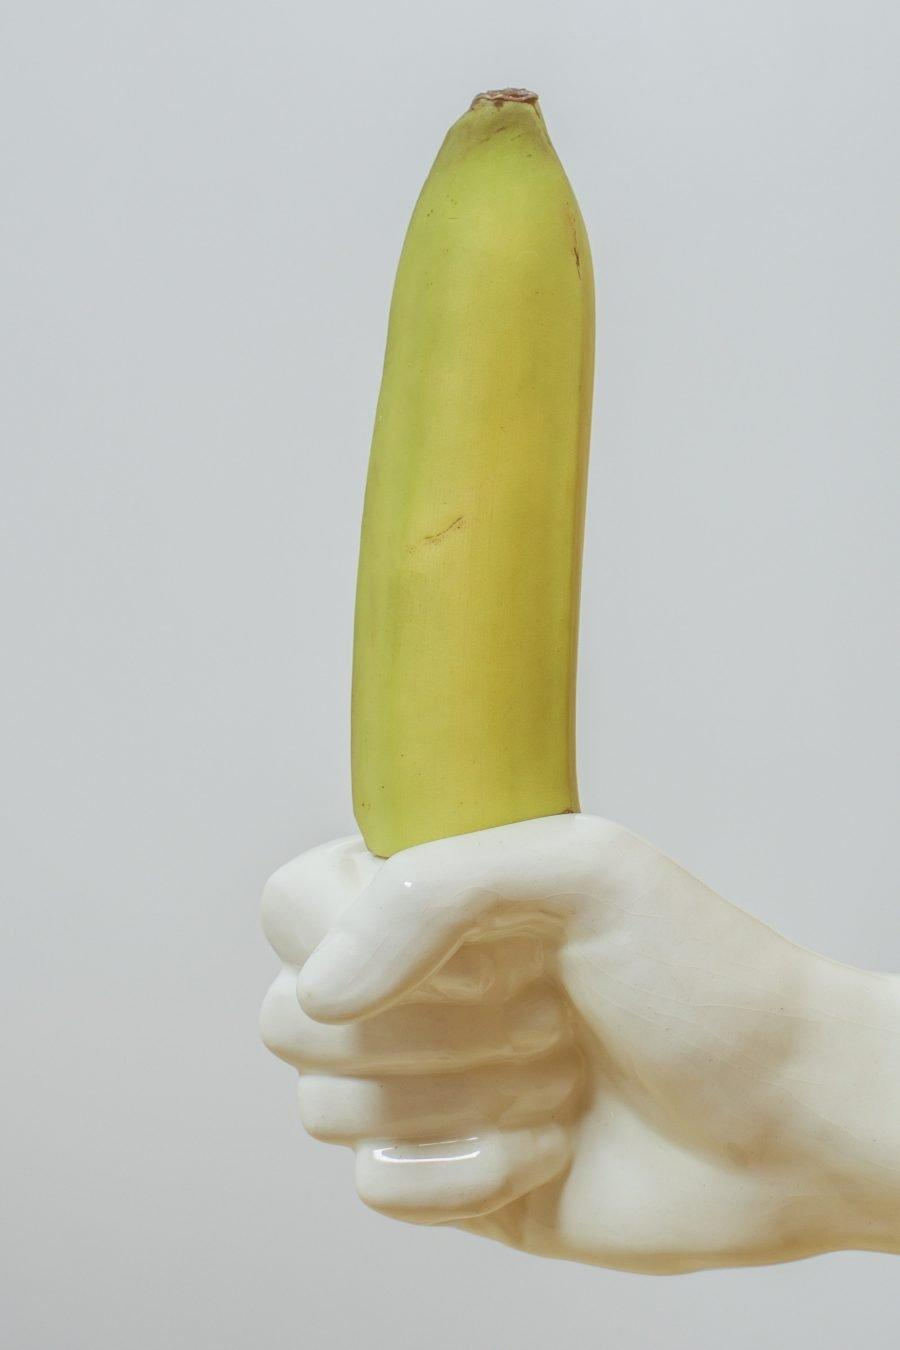 De penis is de vijand van de gigolo